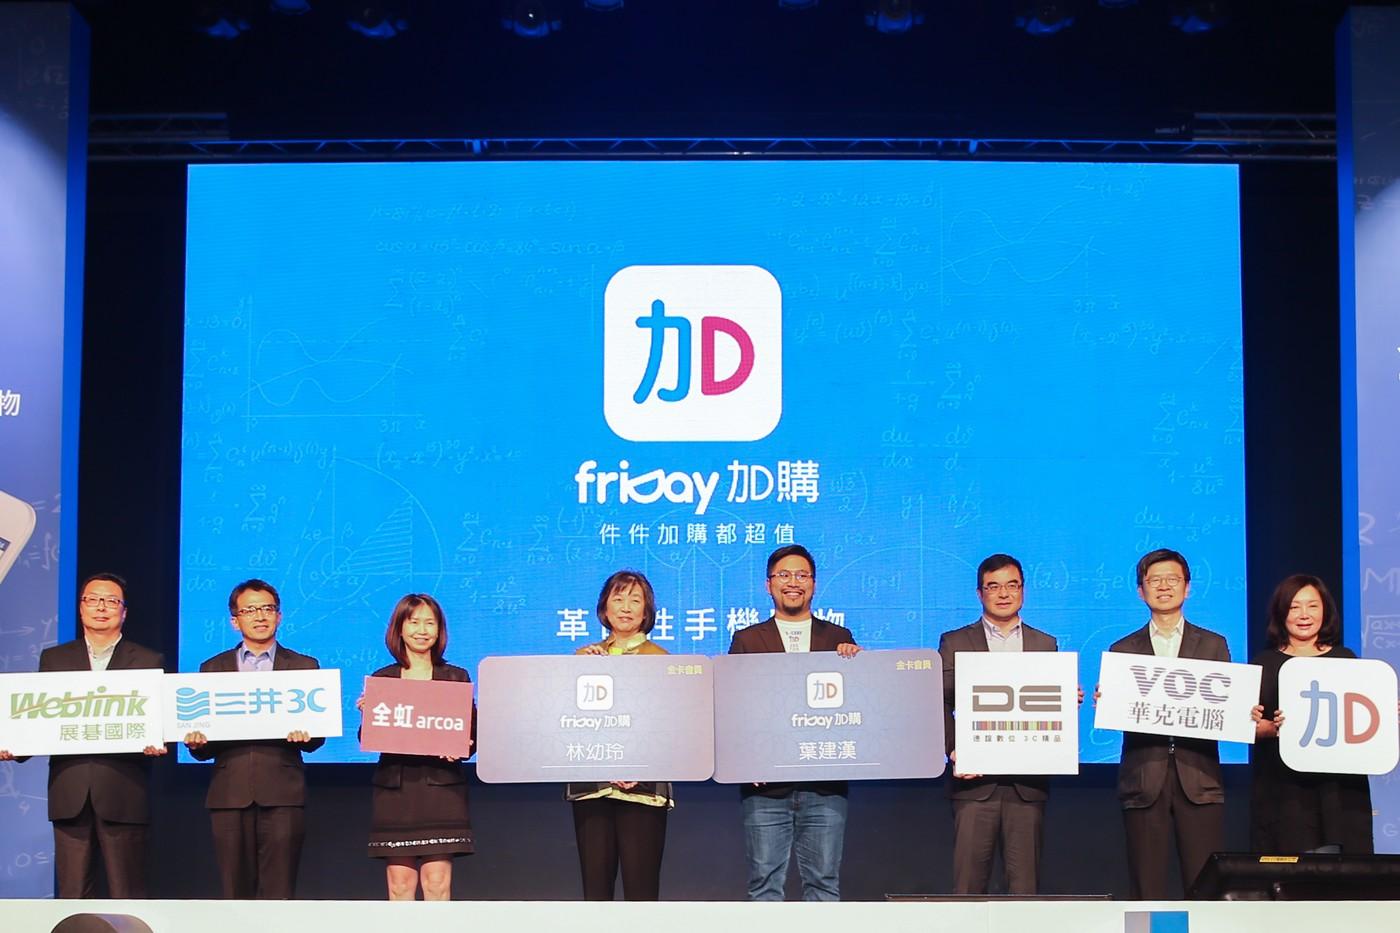 friDay加購新平台不是「COSTCO」模式,而是傳統零售B2C終結槍響起|數位時代